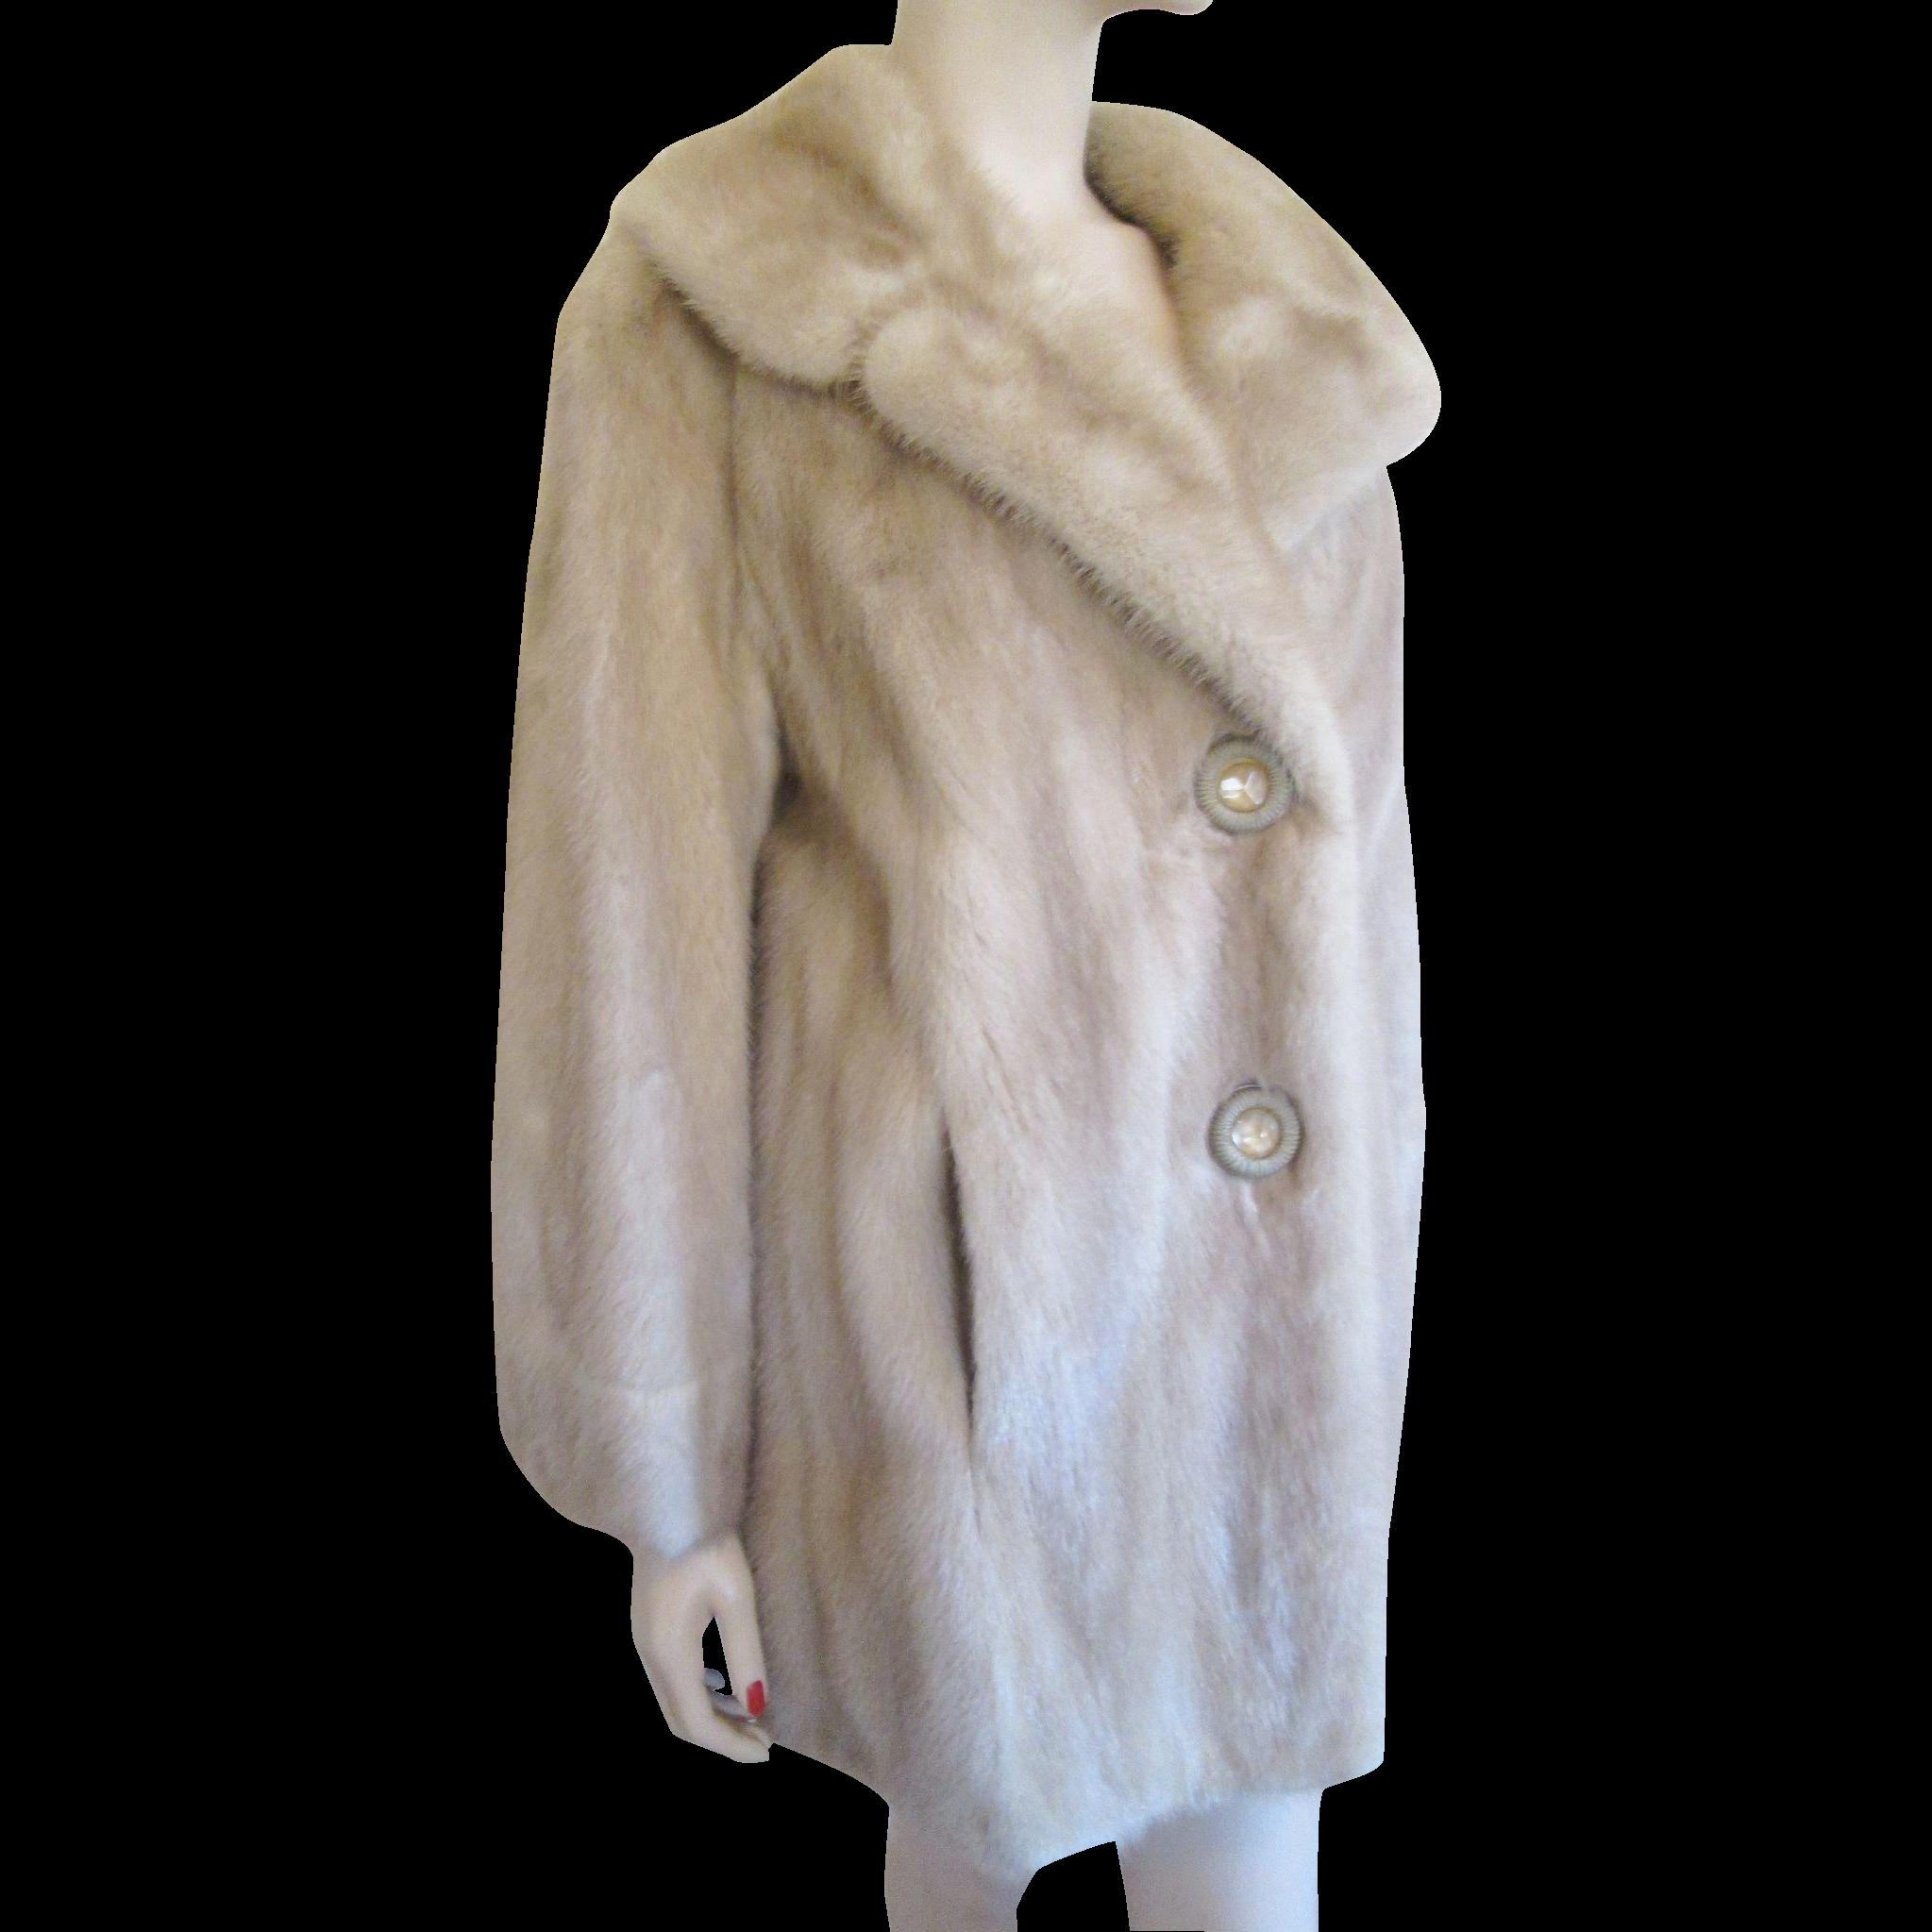 Fur Coats White Png Image White Fur Coat Fur Coat Vintage Brown Fur Coat